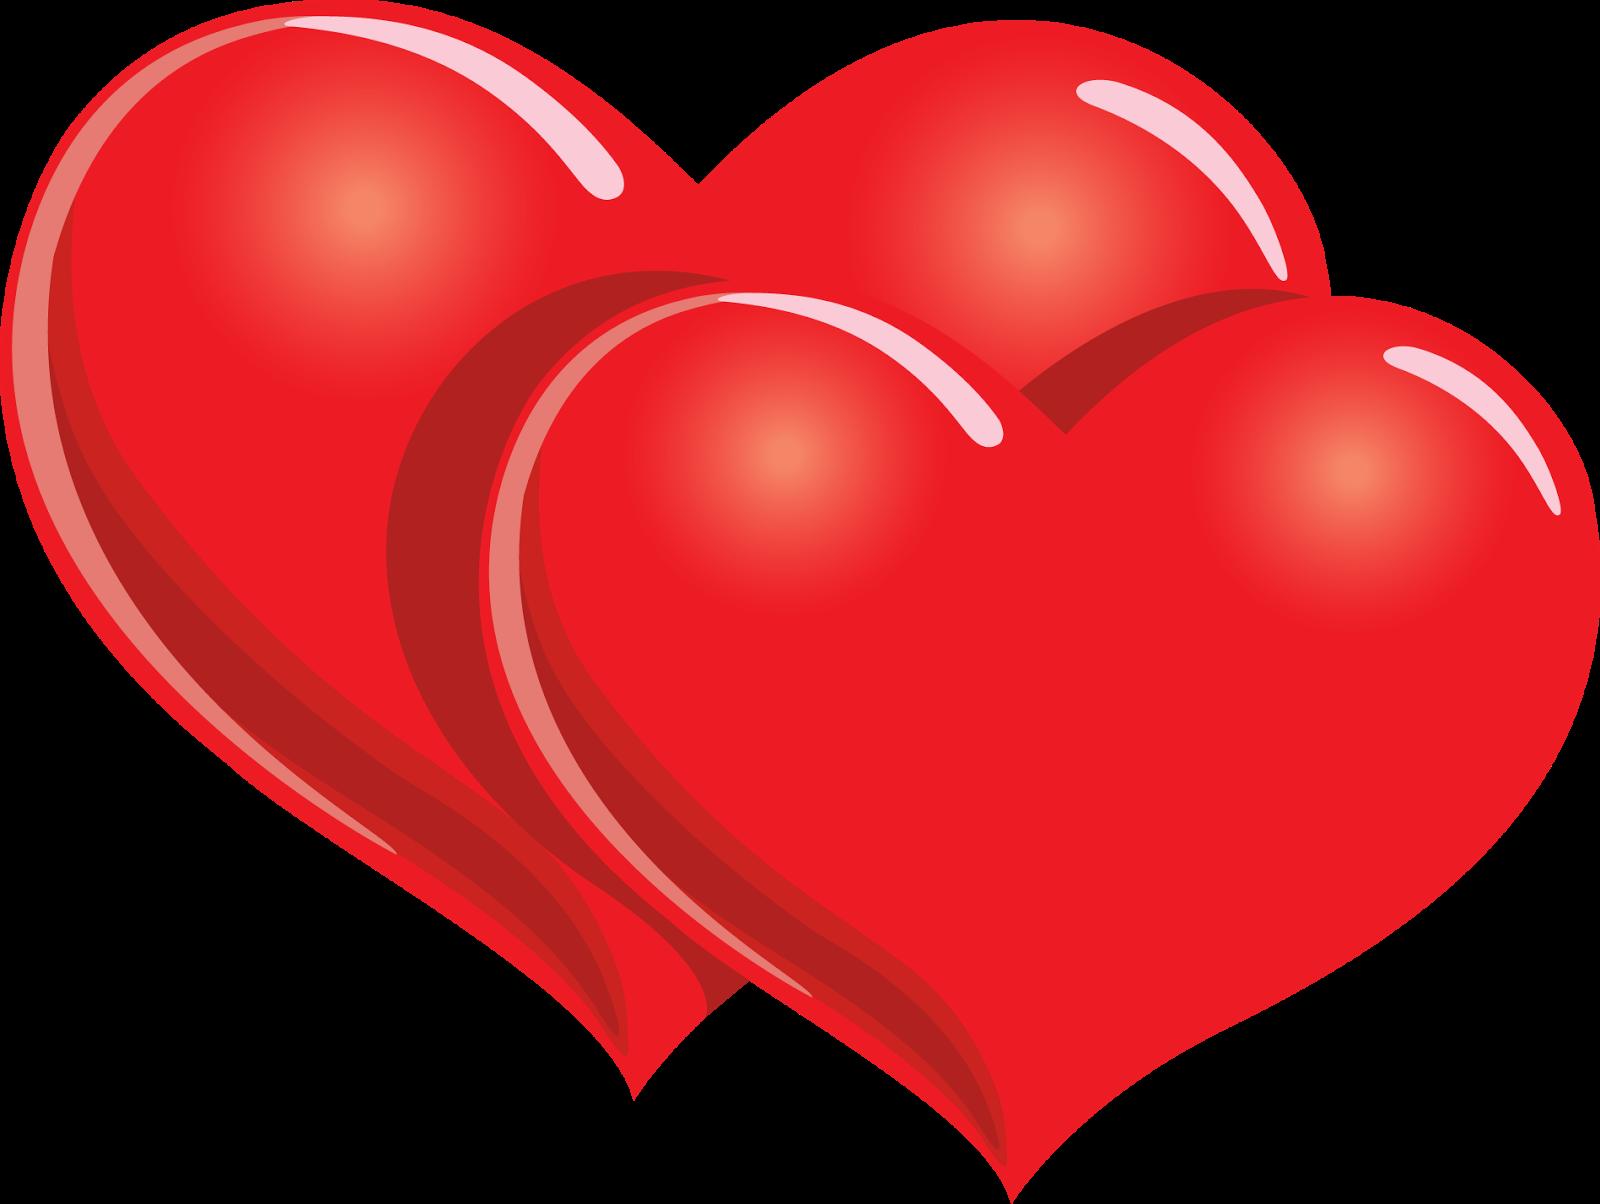 valentine's day specials - save 25% - steve altier, Ideas